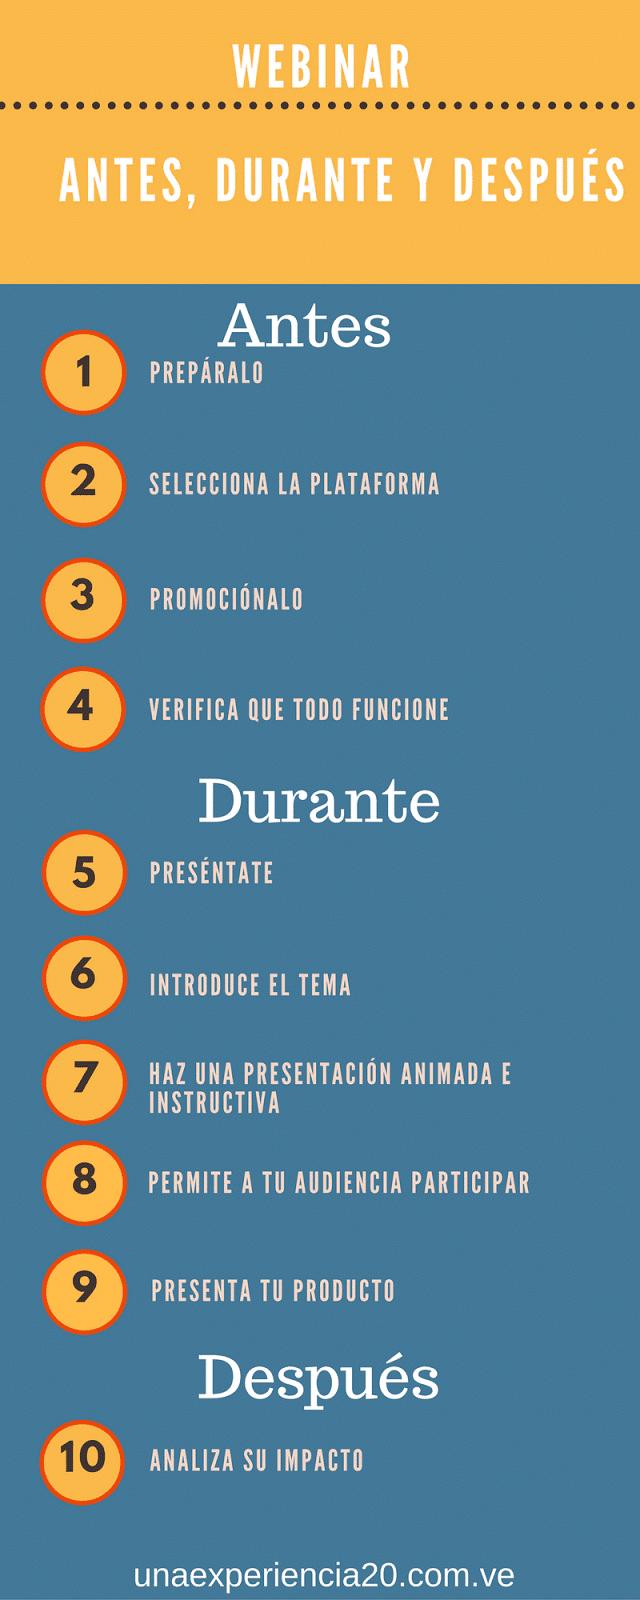 Webinar Infografía